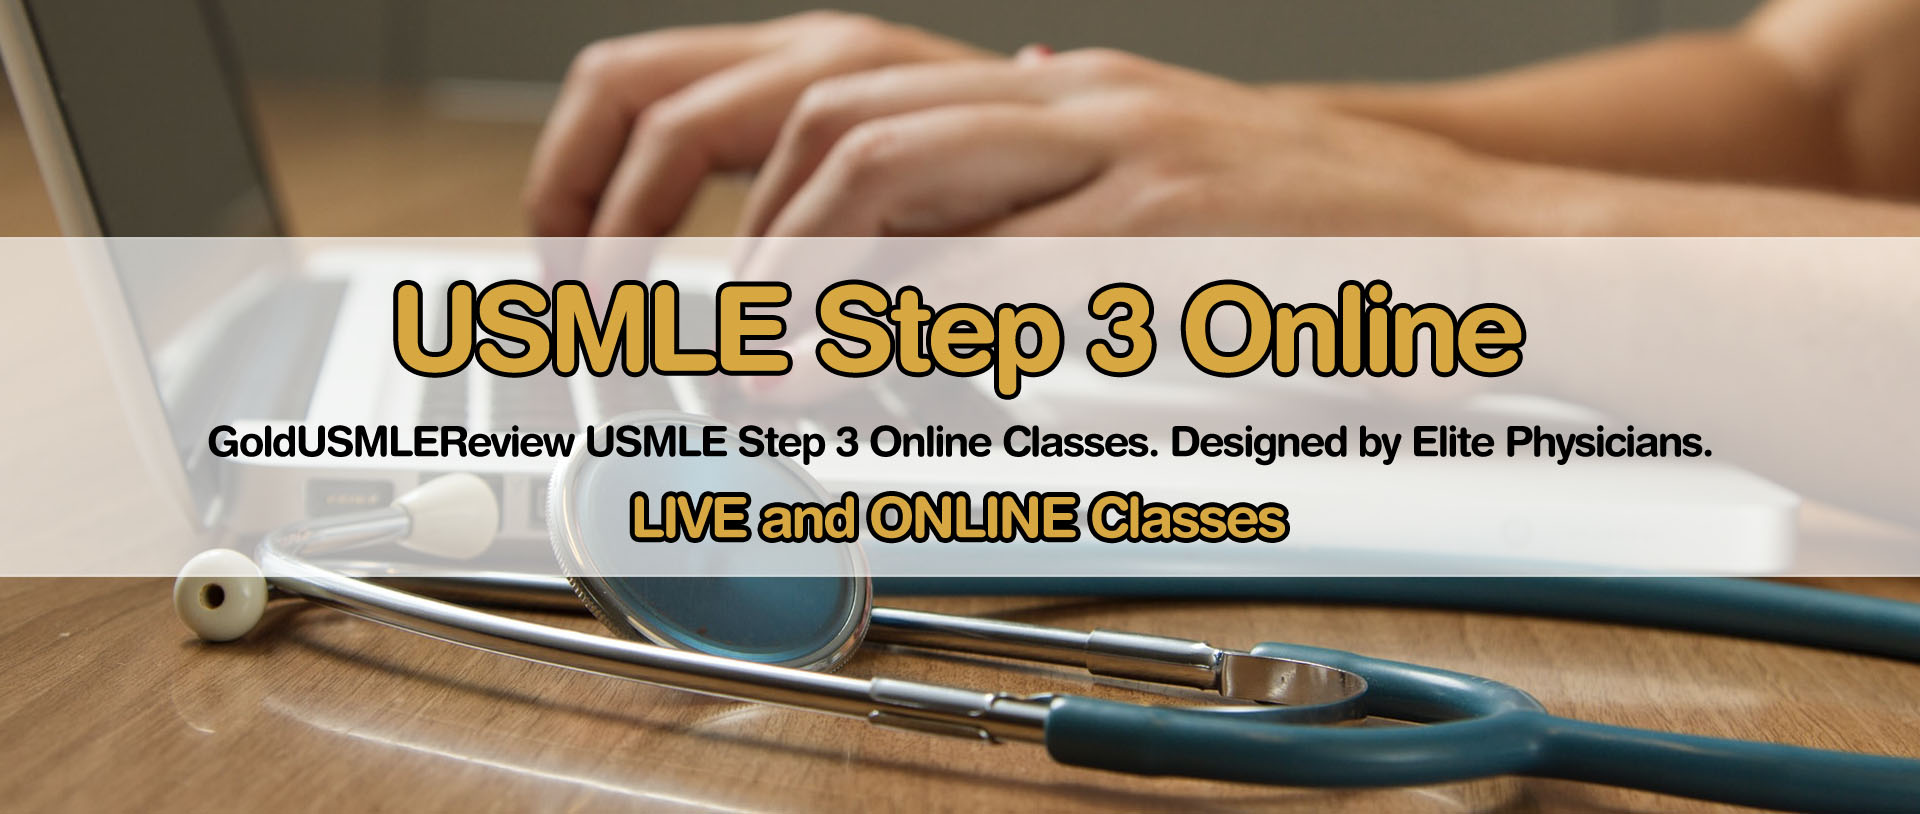 USMLE Step 3 Online Classes